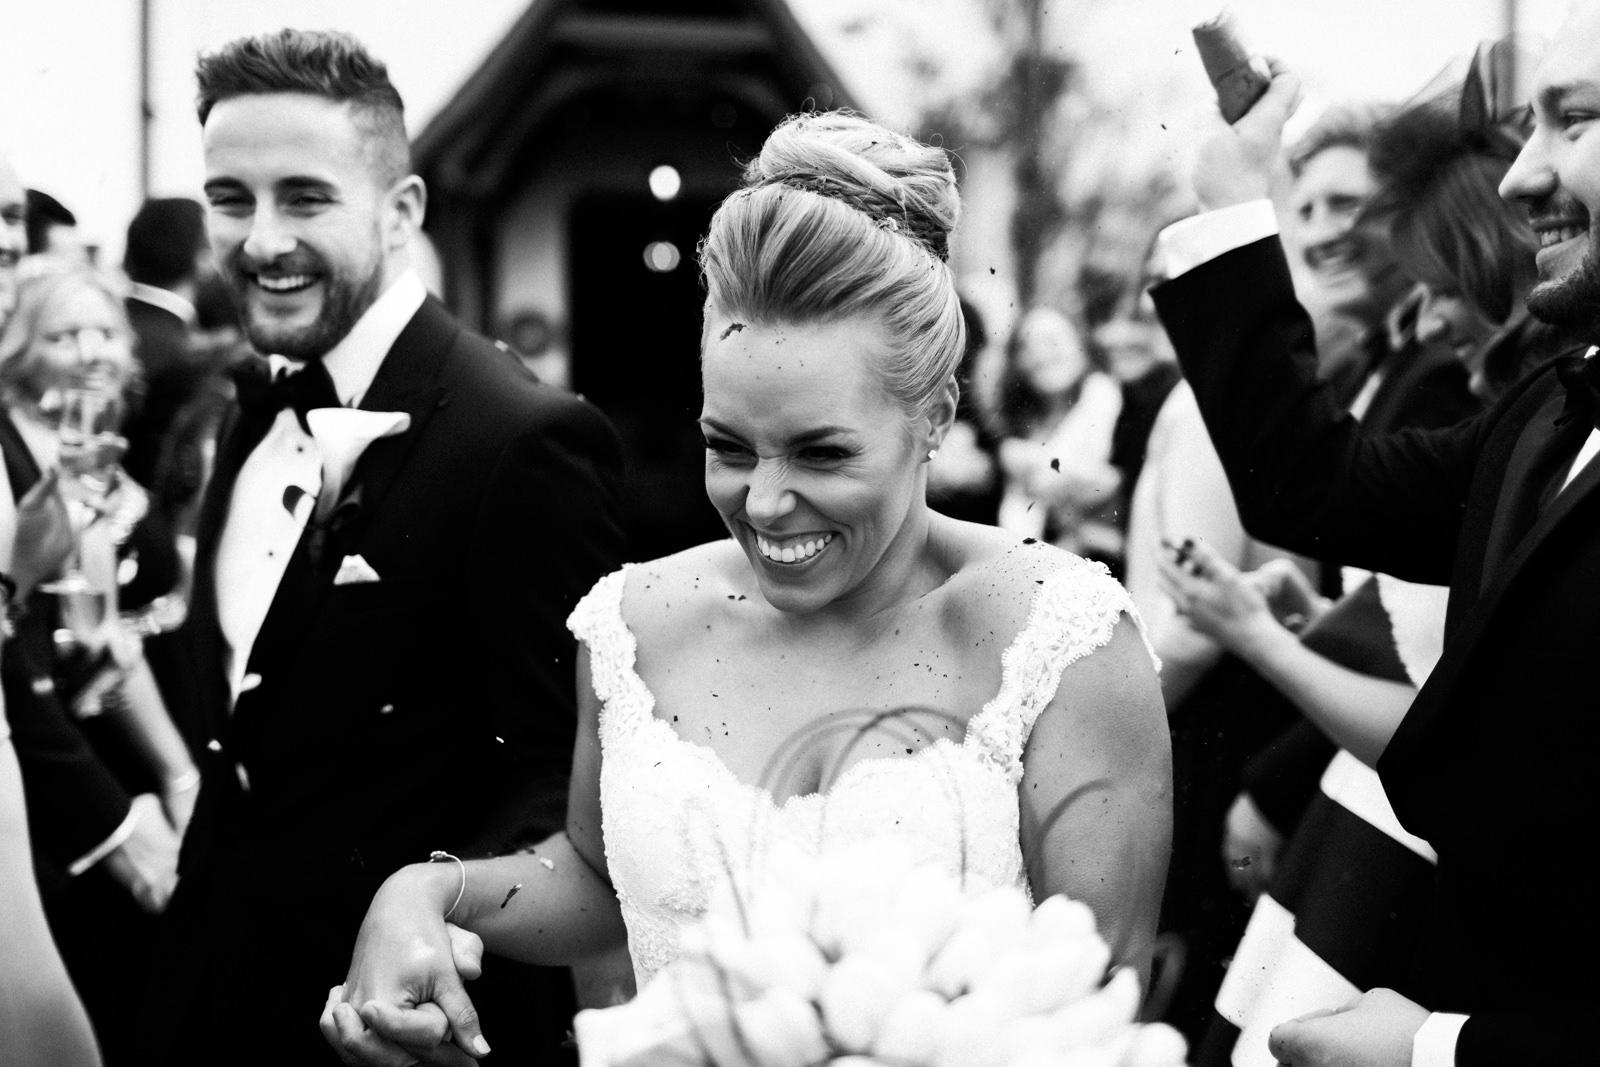 narberth-wedding-bride-groom-winter-wedding